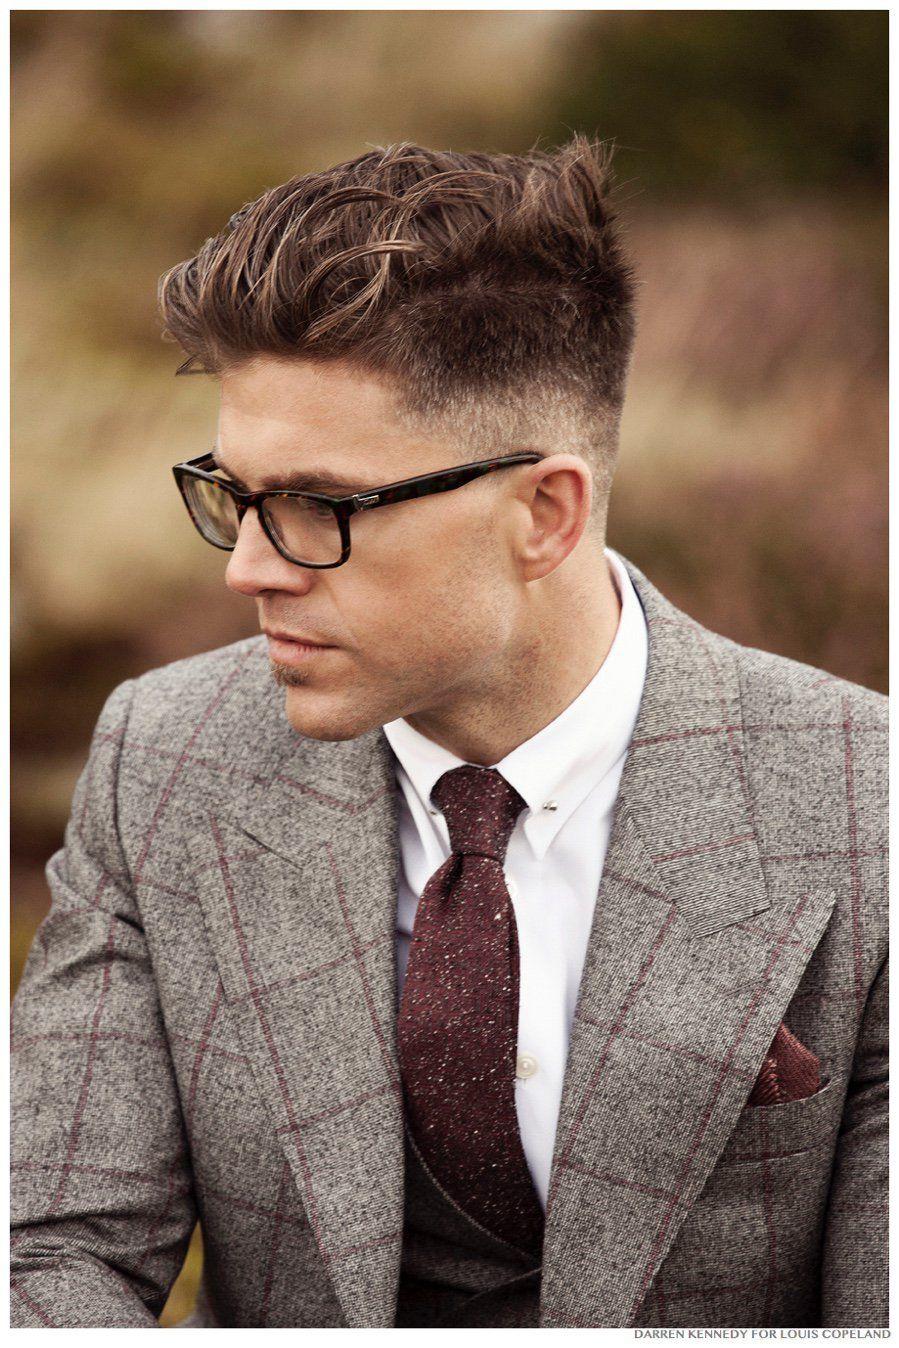 Haircut for men professional darren kennedy reunites with louis copeland for fallwinter